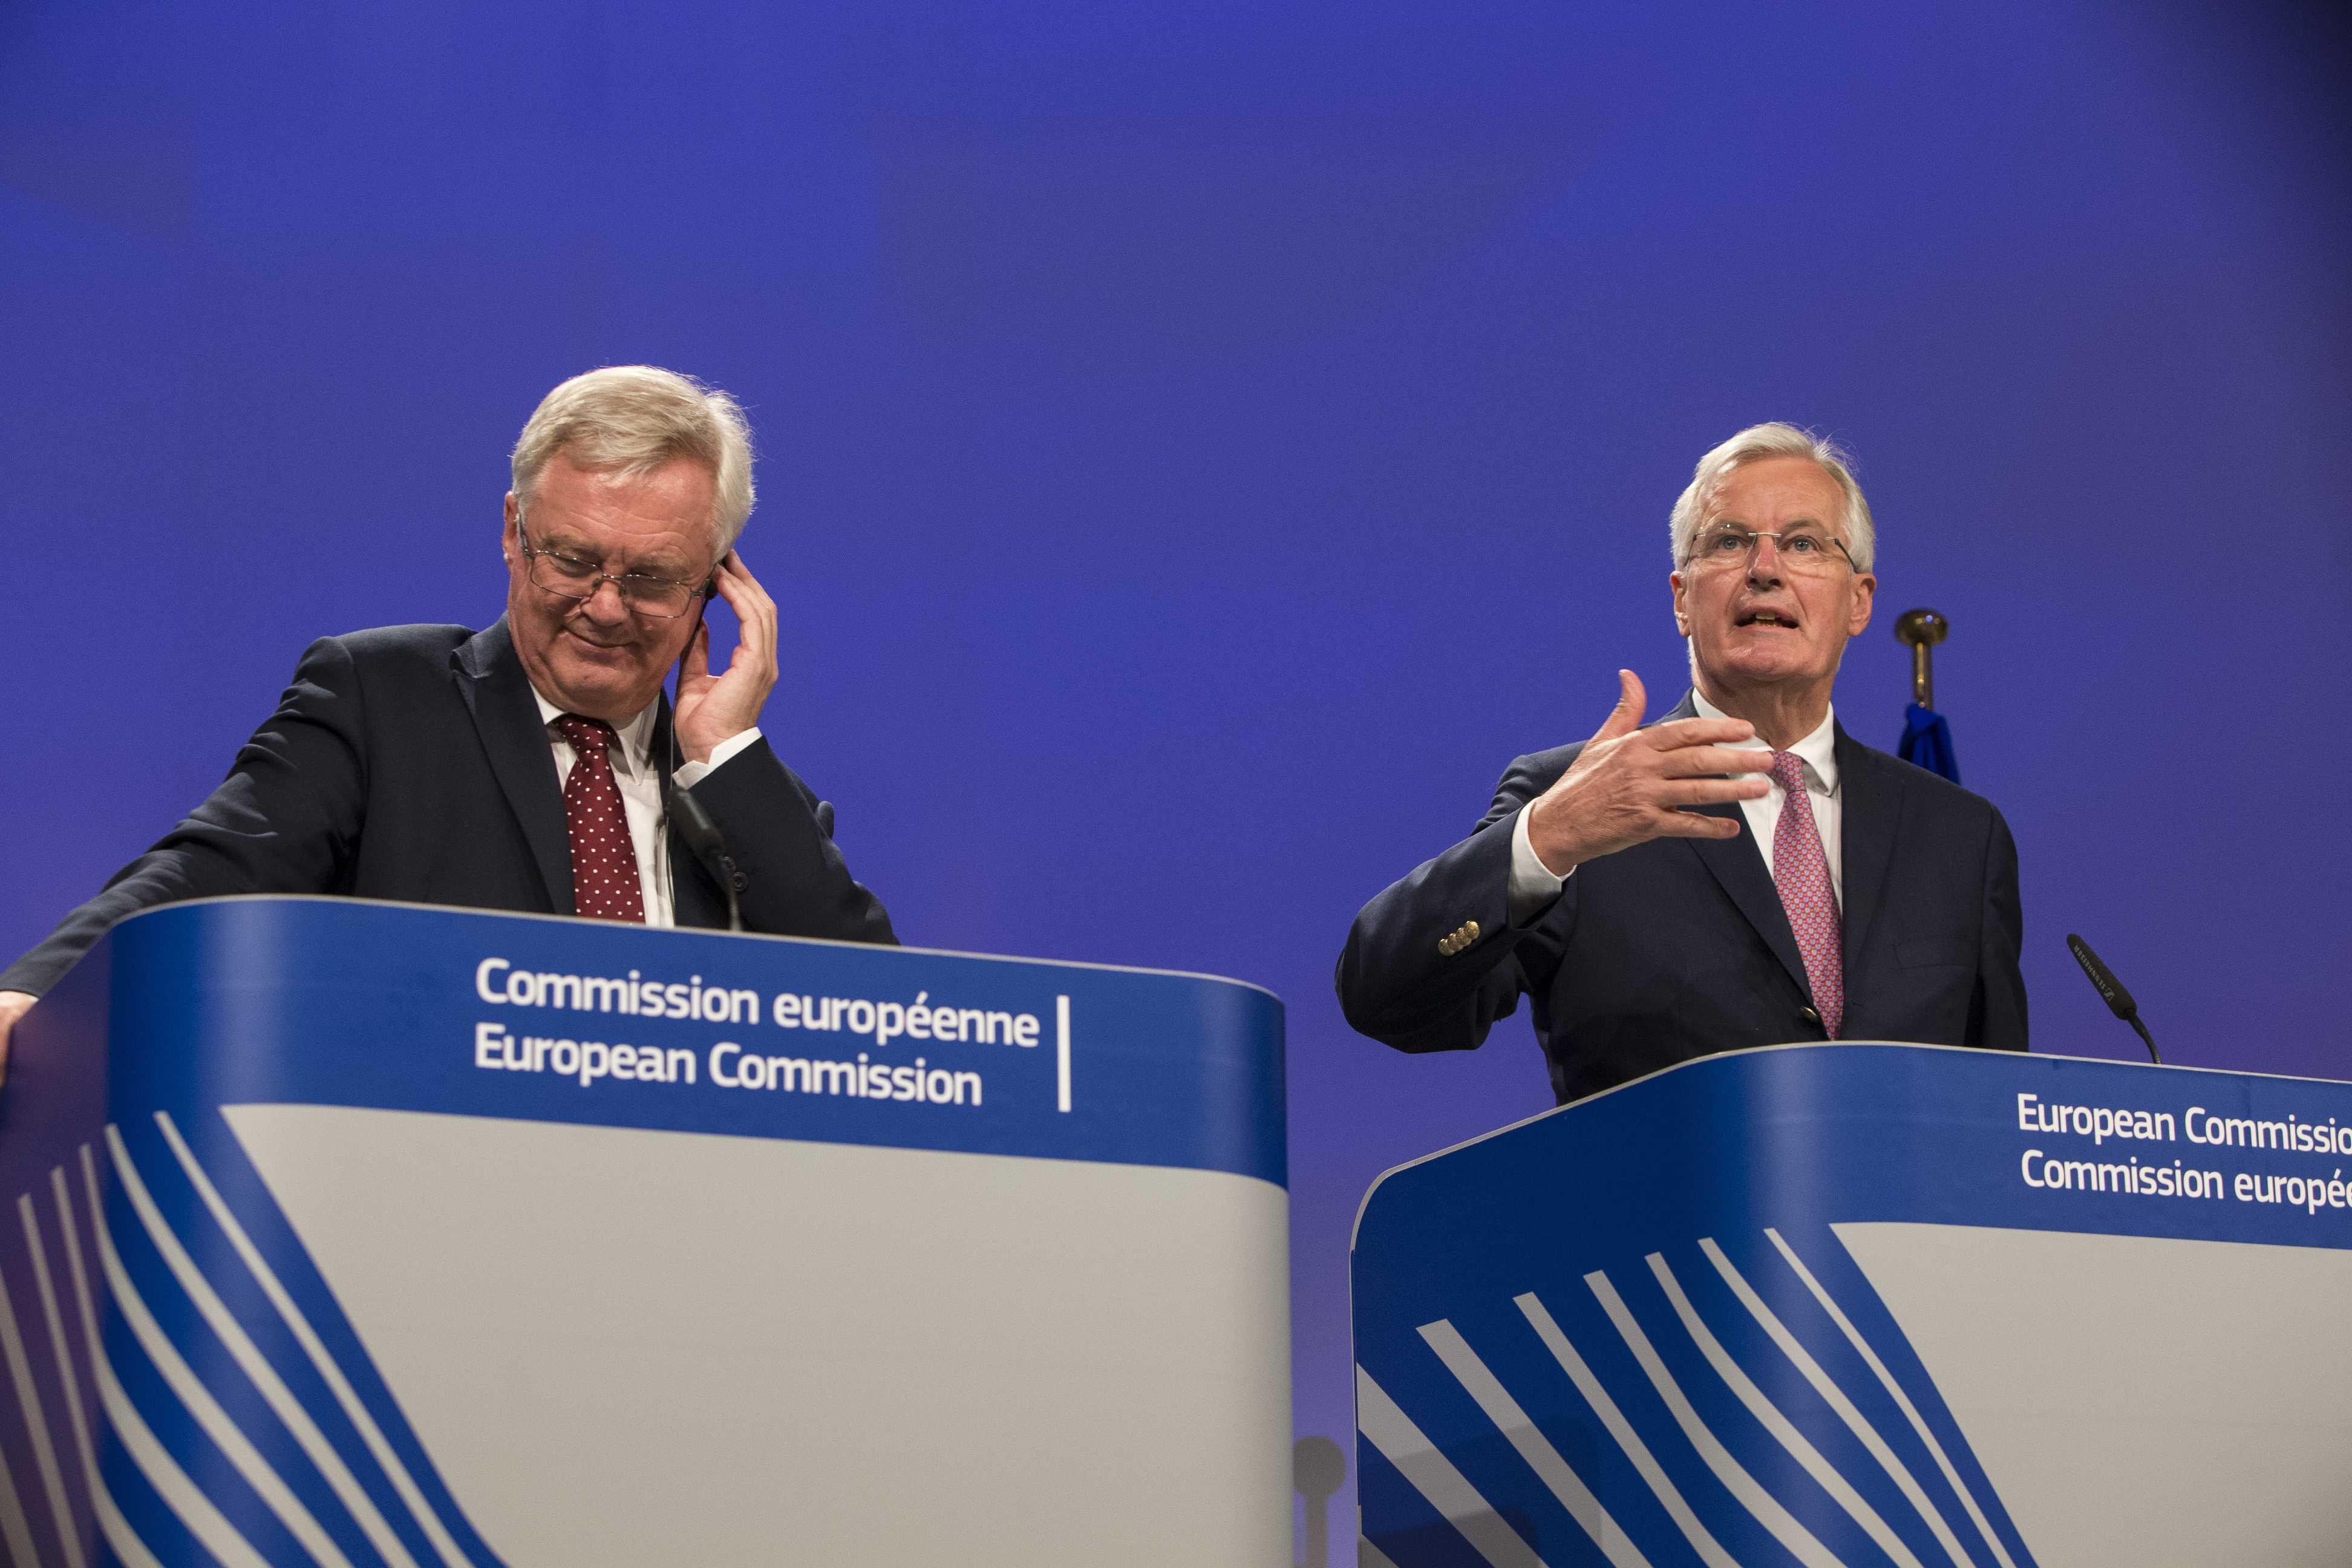 Photo - David Davis and Michel Barnier